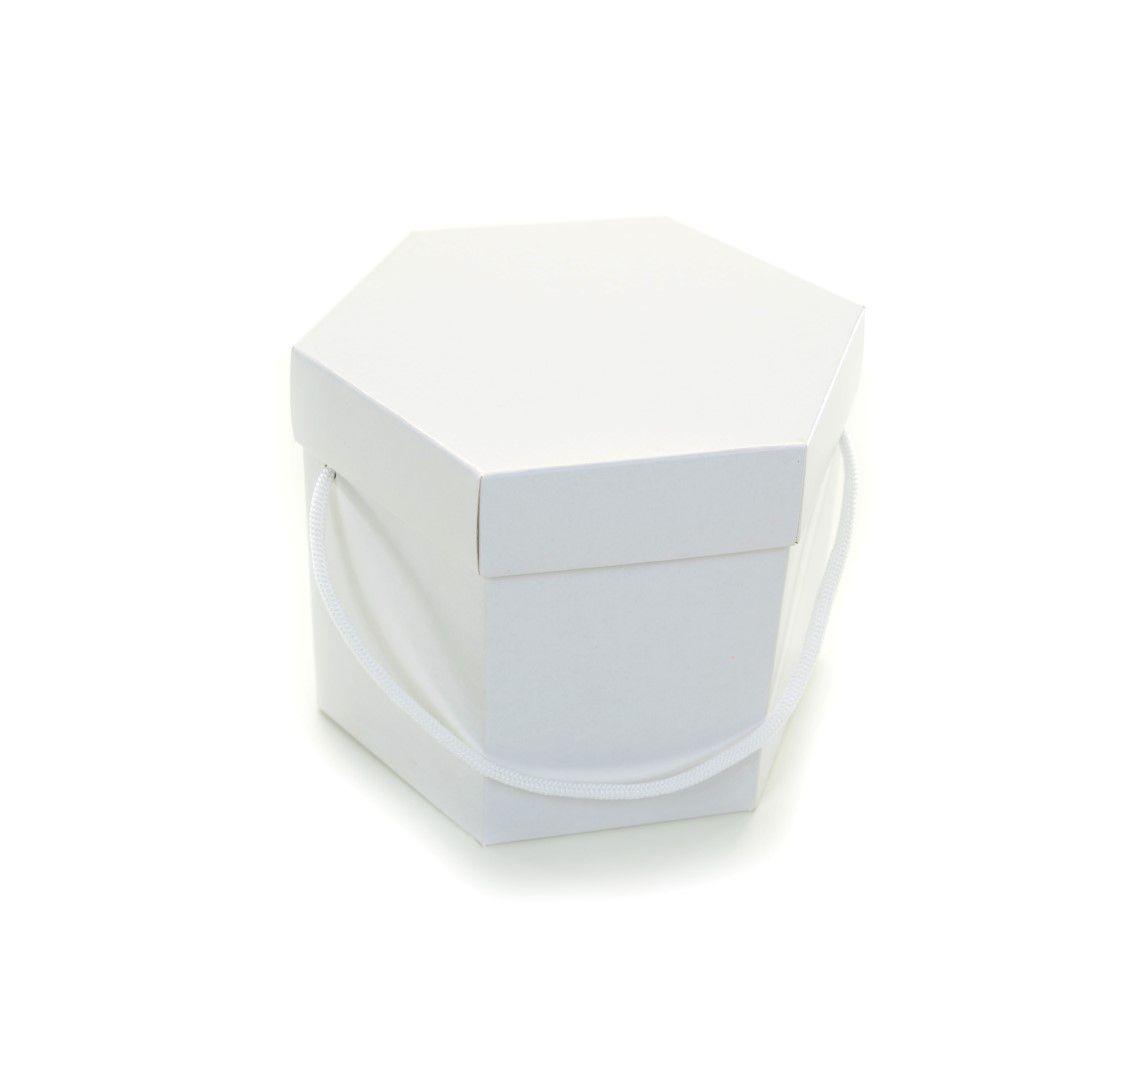 Ref 009 Branca - Caixa Sextavada c/ alça - 8,5x14 cm - c/ 10 unidades